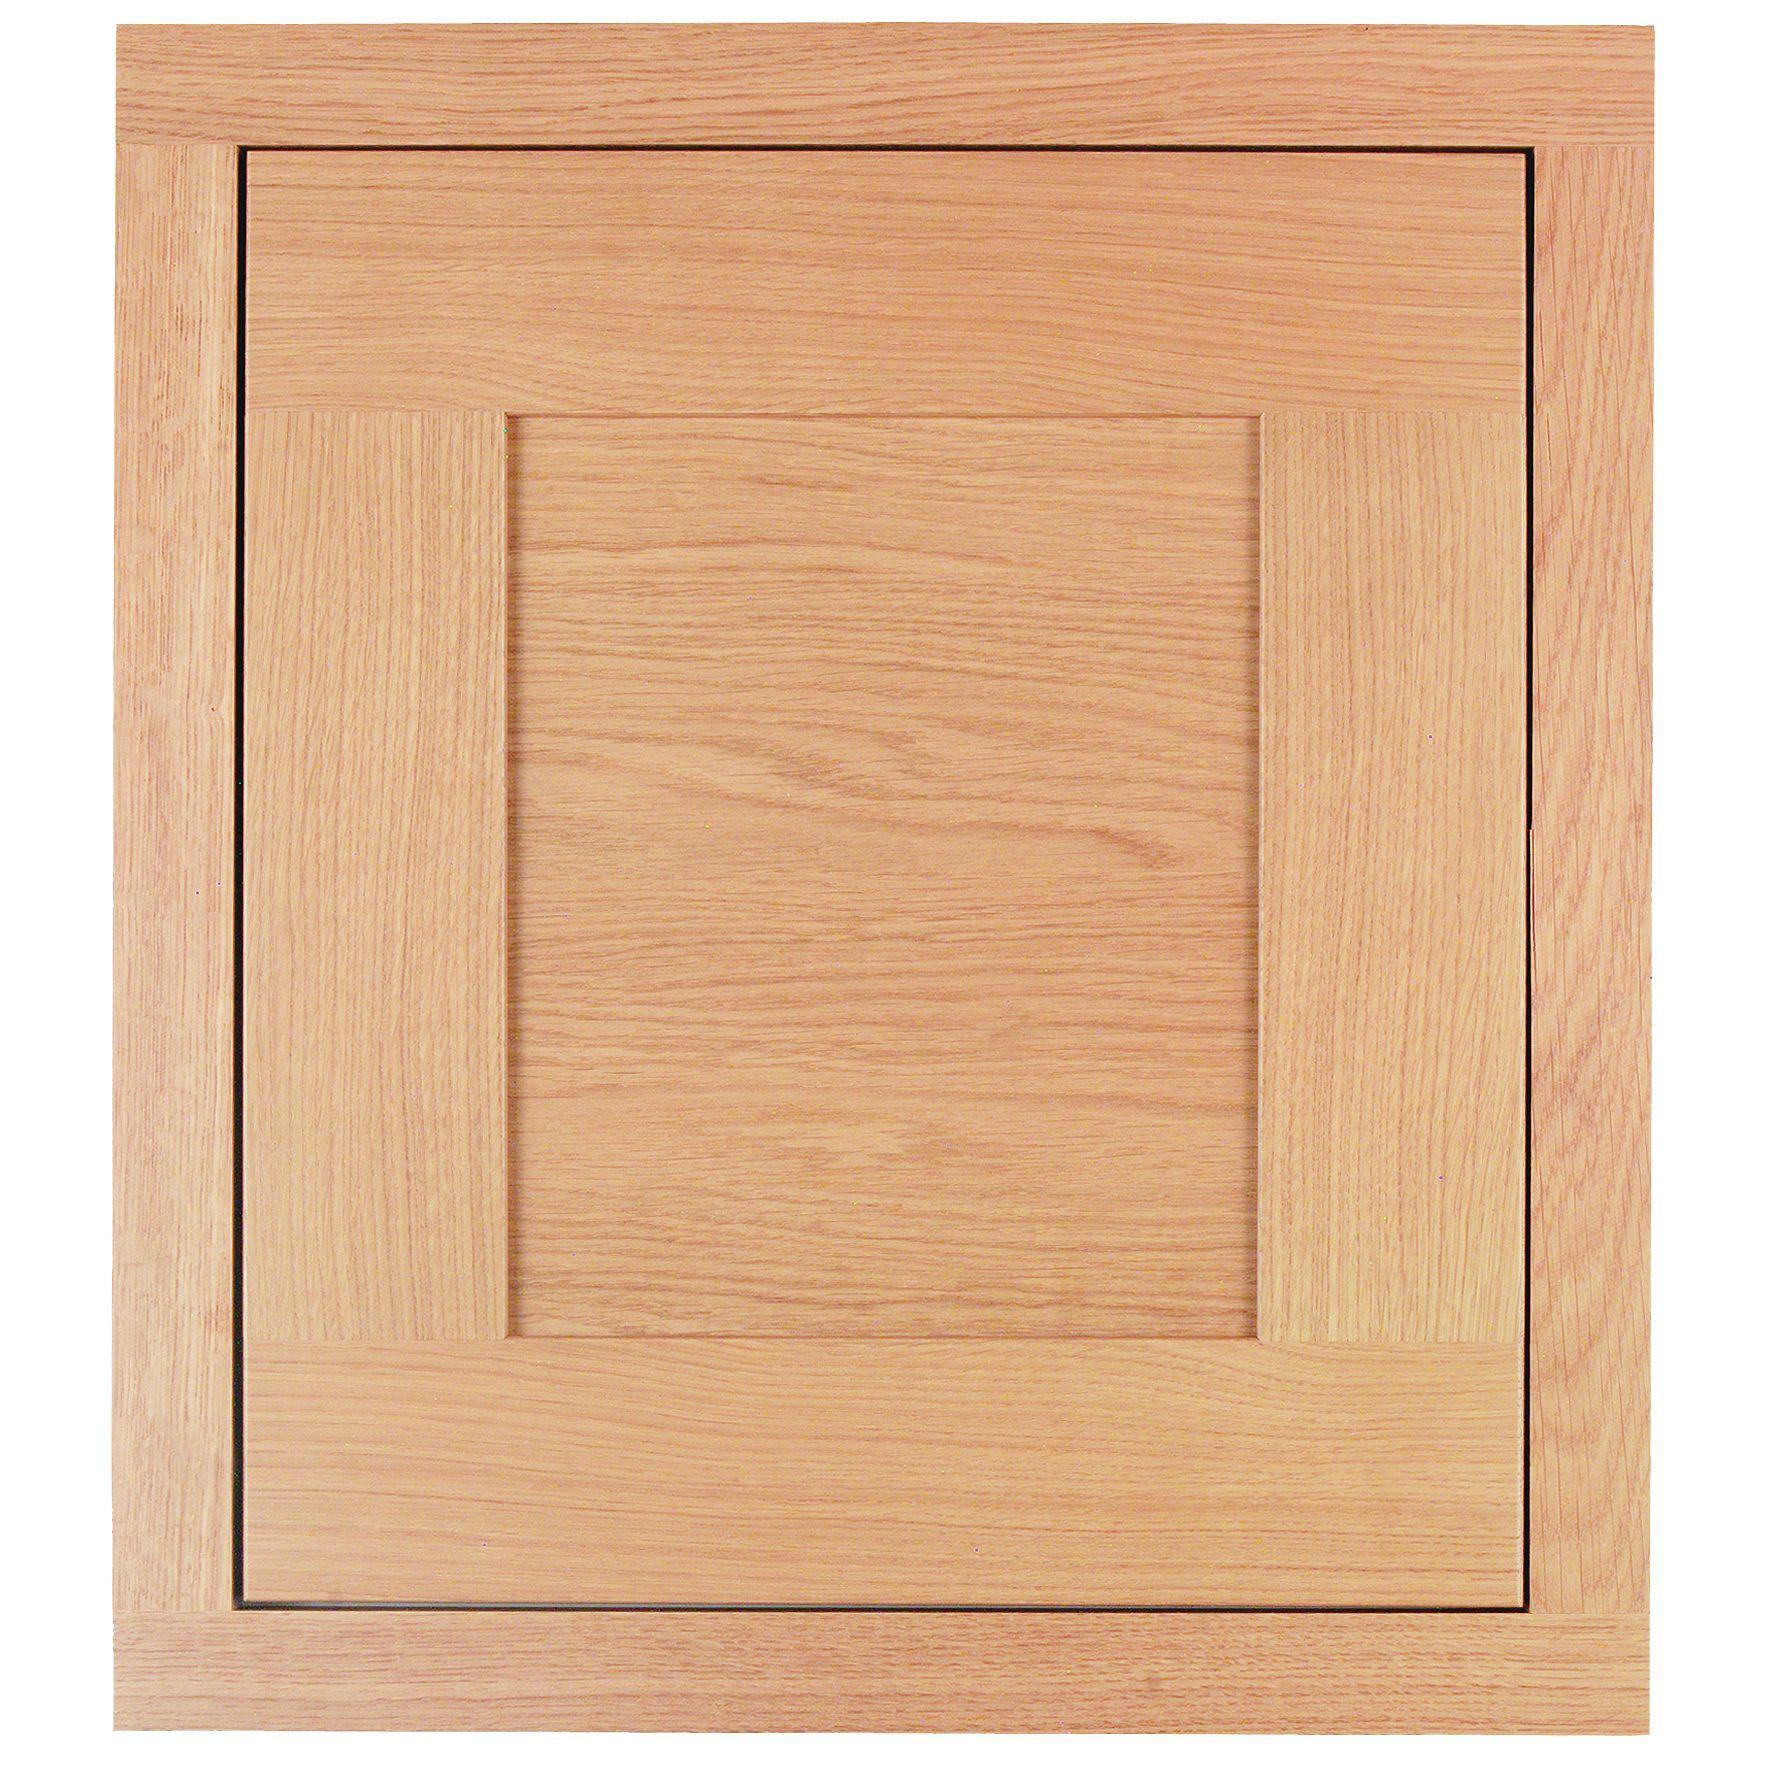 Cooke Lewis Carisbrooke Oak Framed Deep Bridging Door W